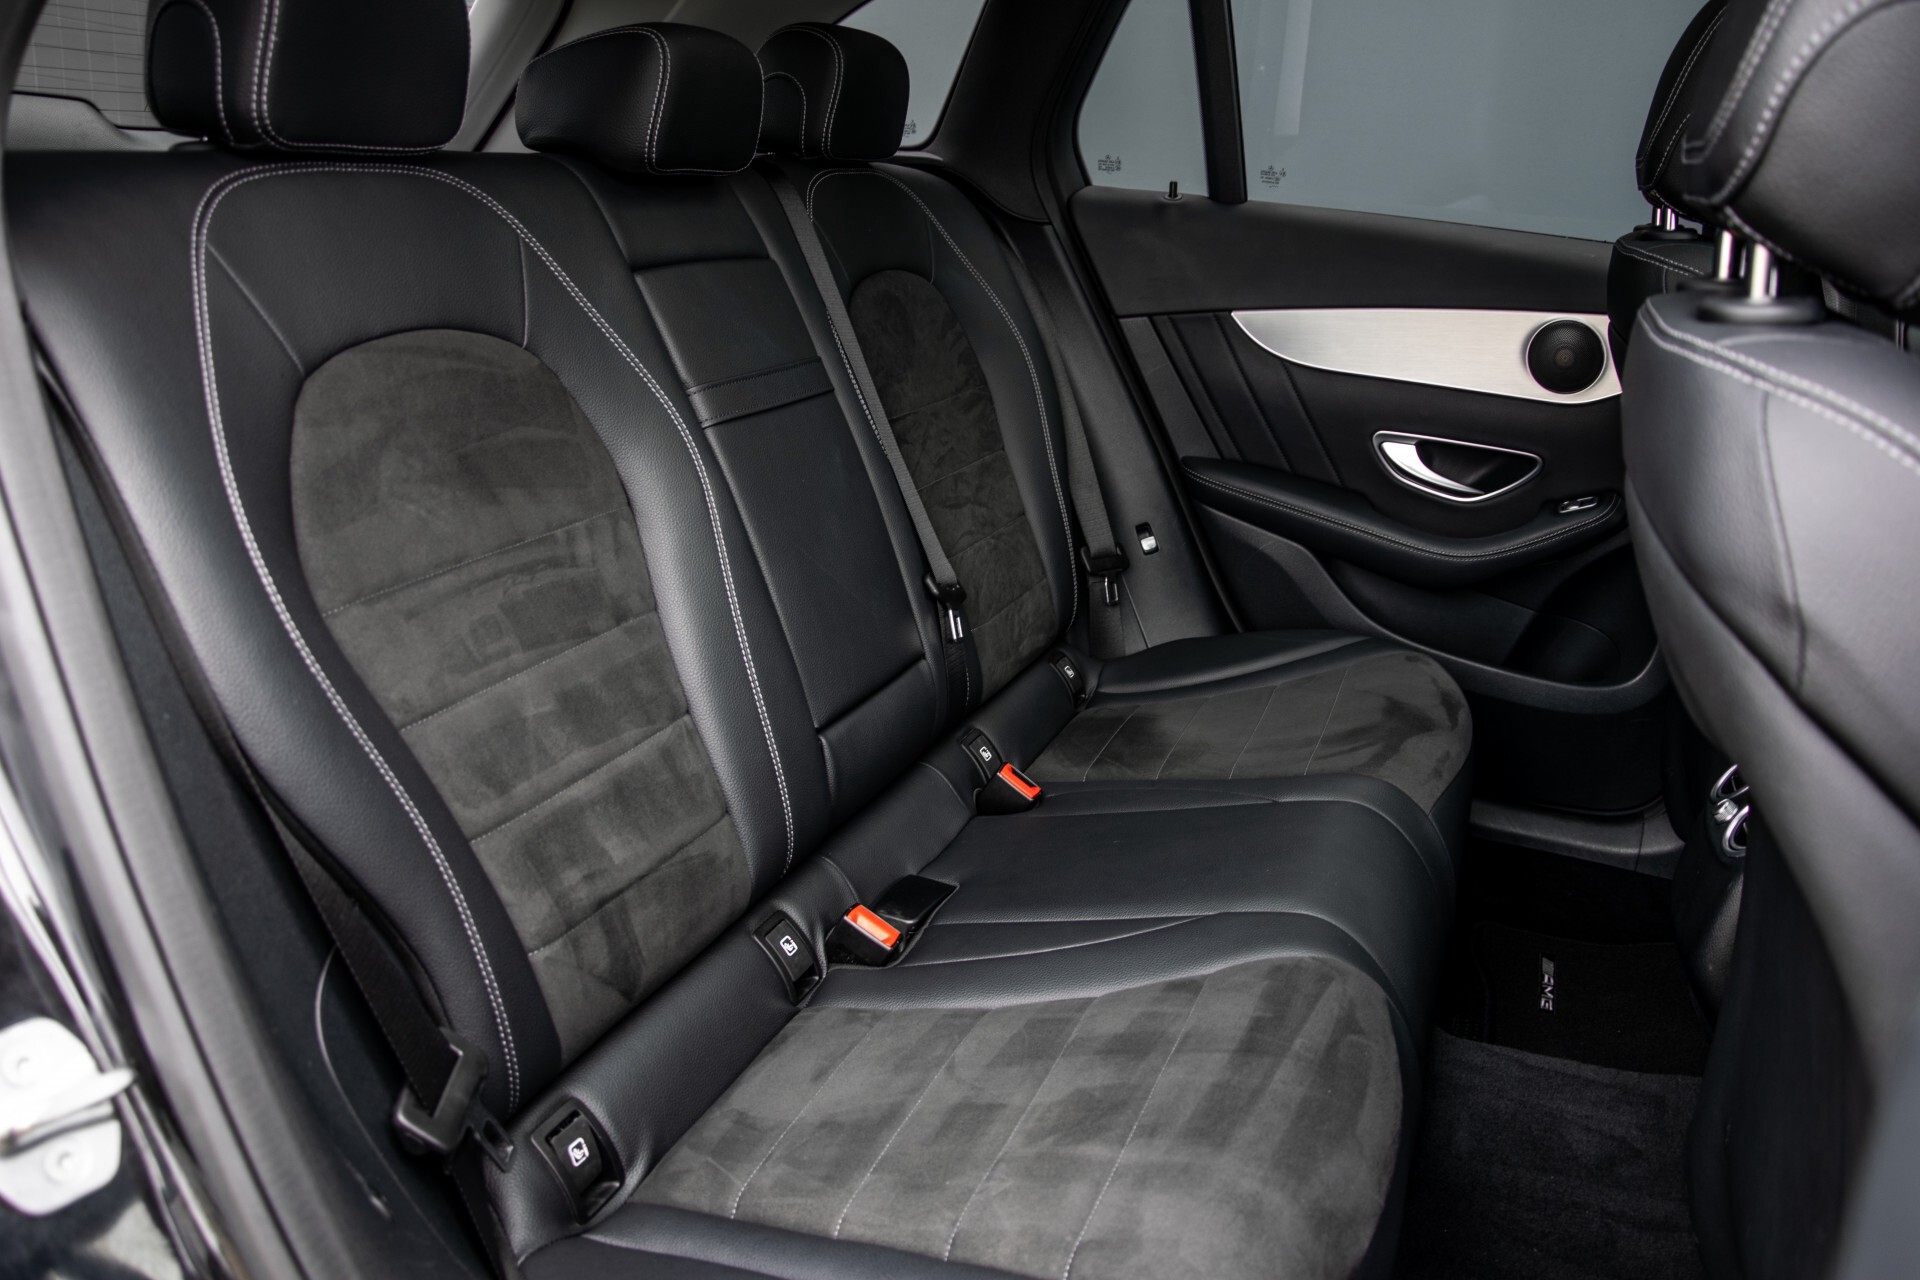 Mercedes-Benz GLC 220 d 4-M AMG/Distronic/Panorama/Comand/HUD/Afn-Trhk Aut9 Foto 4